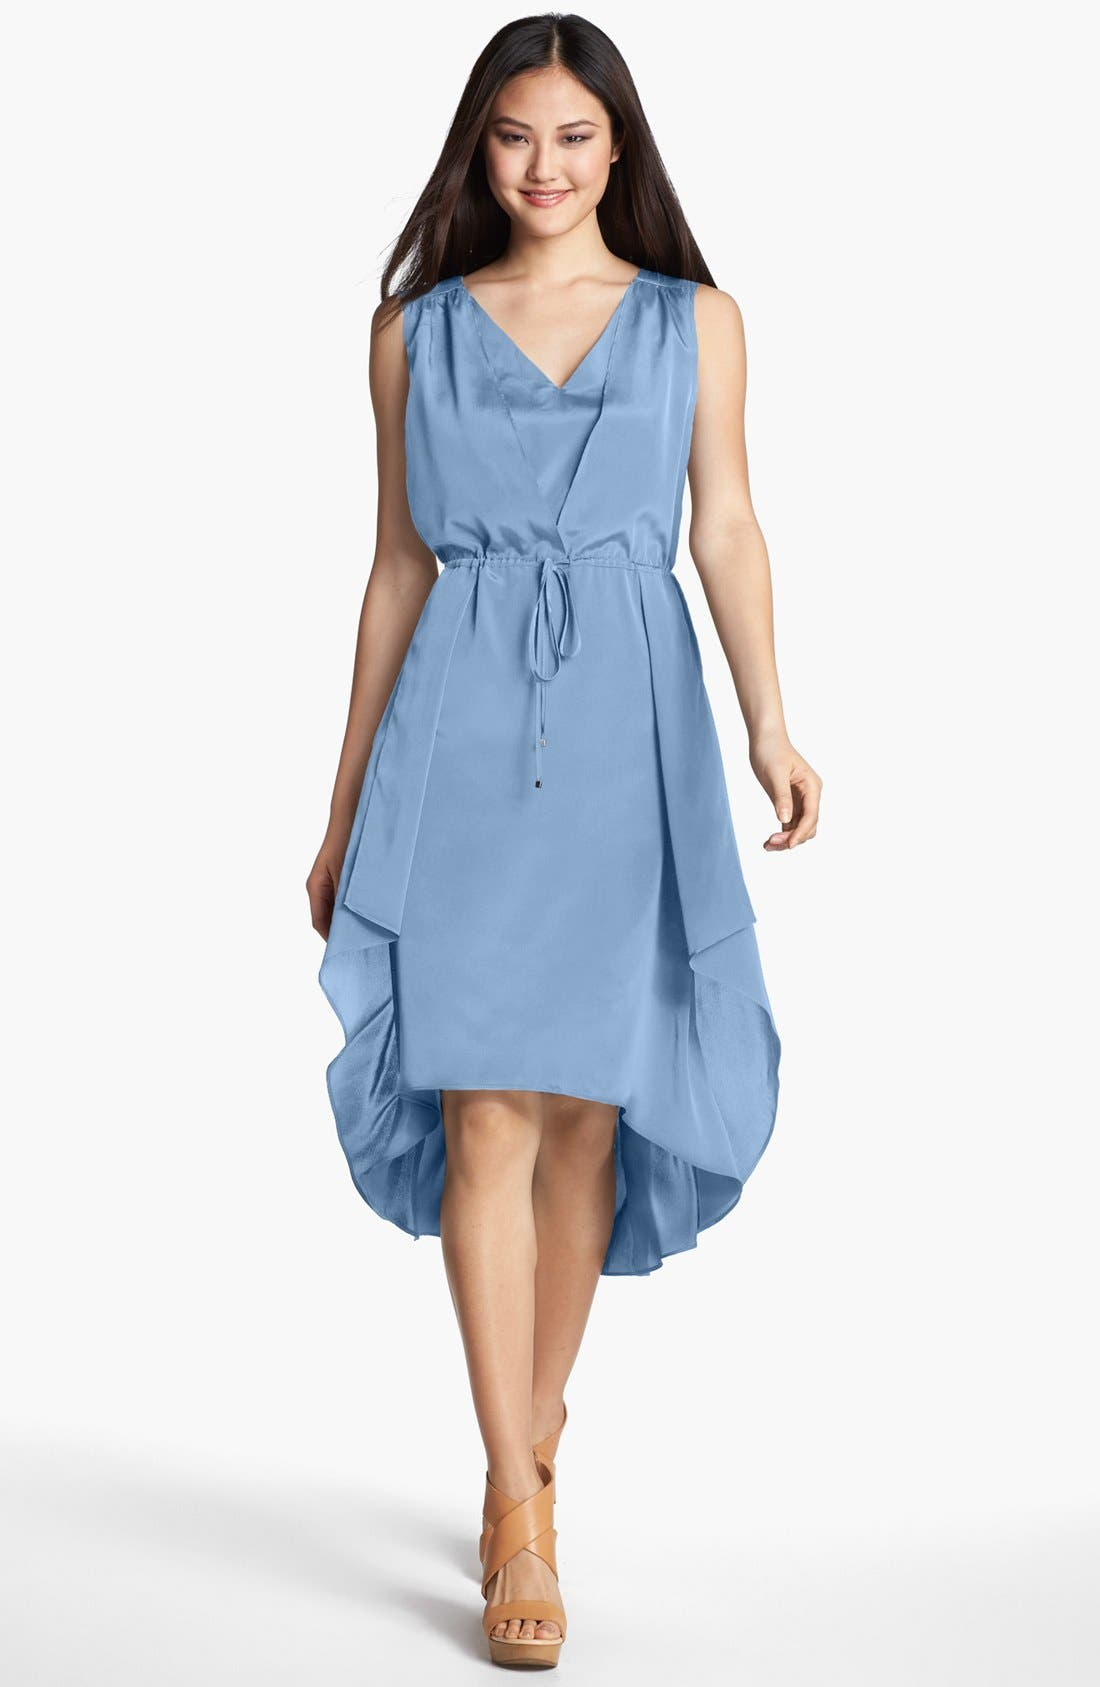 Main Image - Kenneth Cole New York 'Gracey' Sleeveless Dress